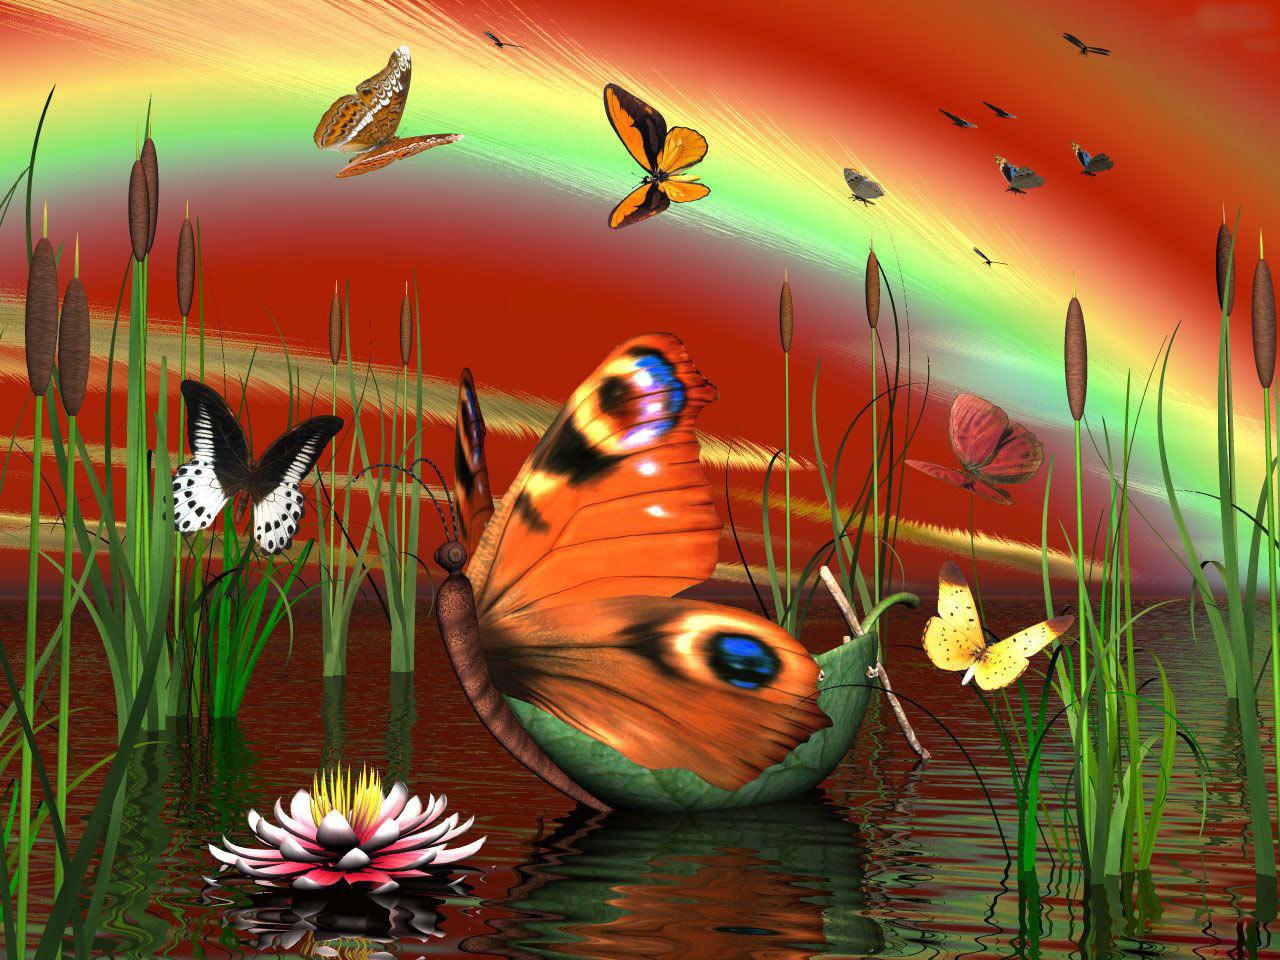 Sfondi desktop farfalle hd sfondi hd gratis for Sfondi farfalle gratis